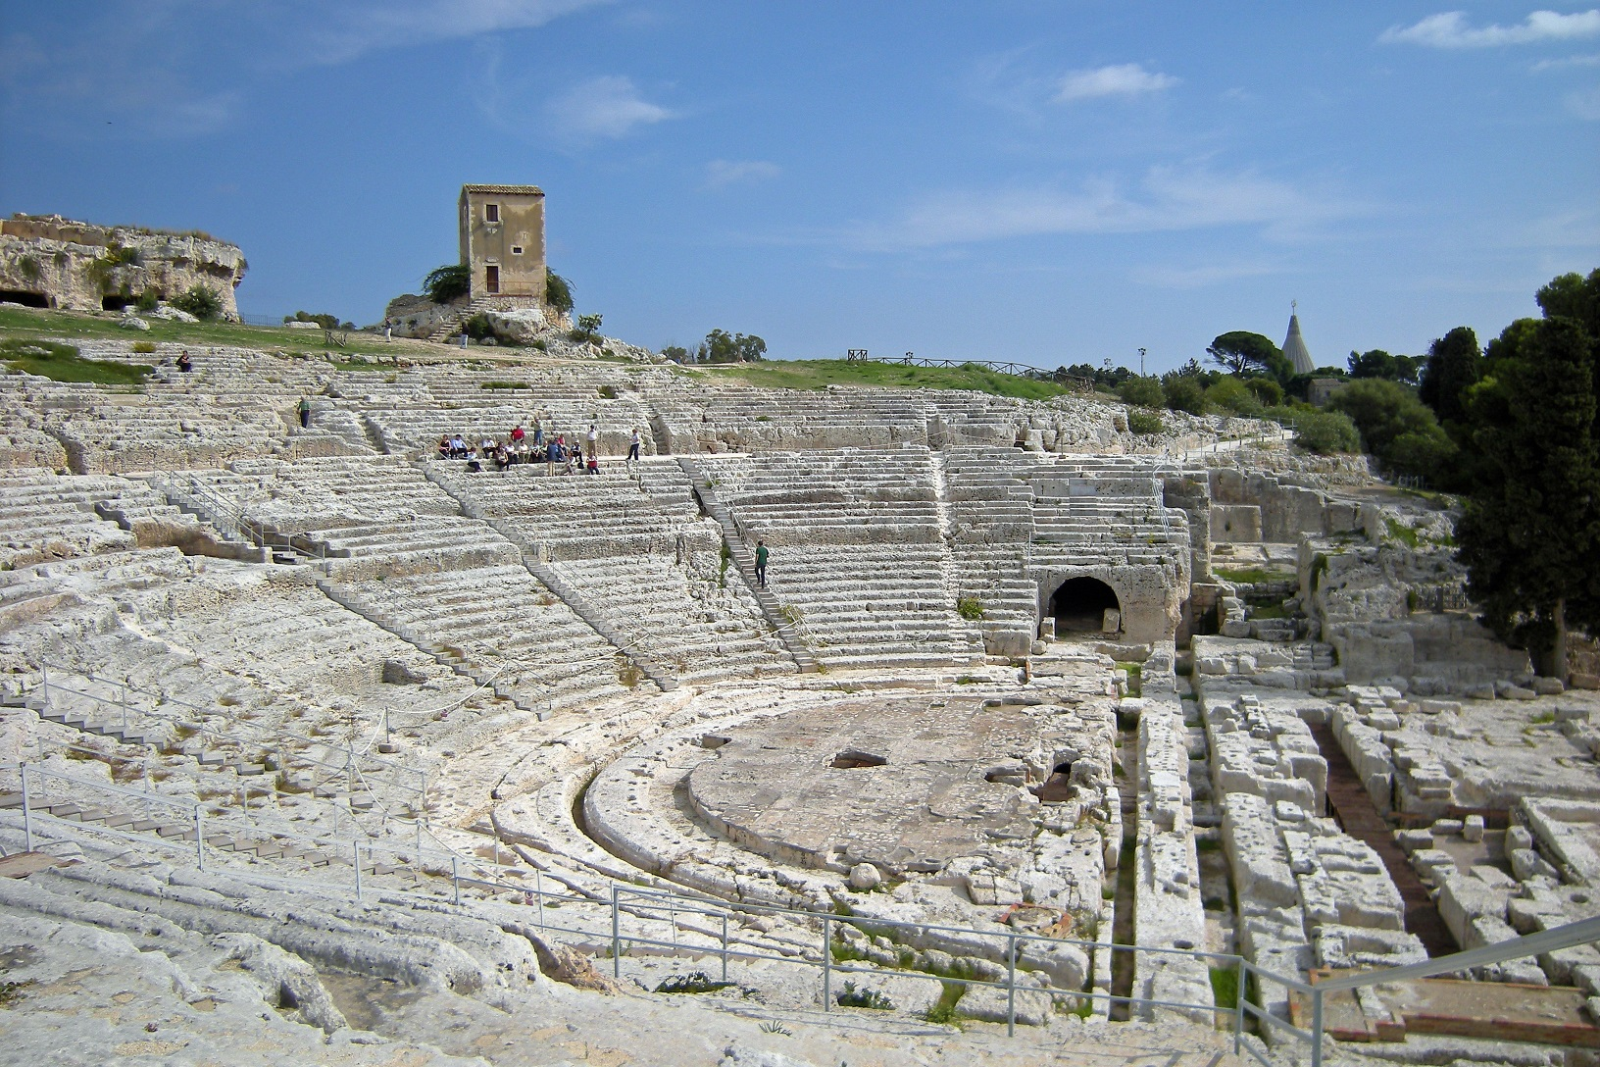 Siracusa teatro greco cronaca oggi quotidiano for Cronaca galatina oggi